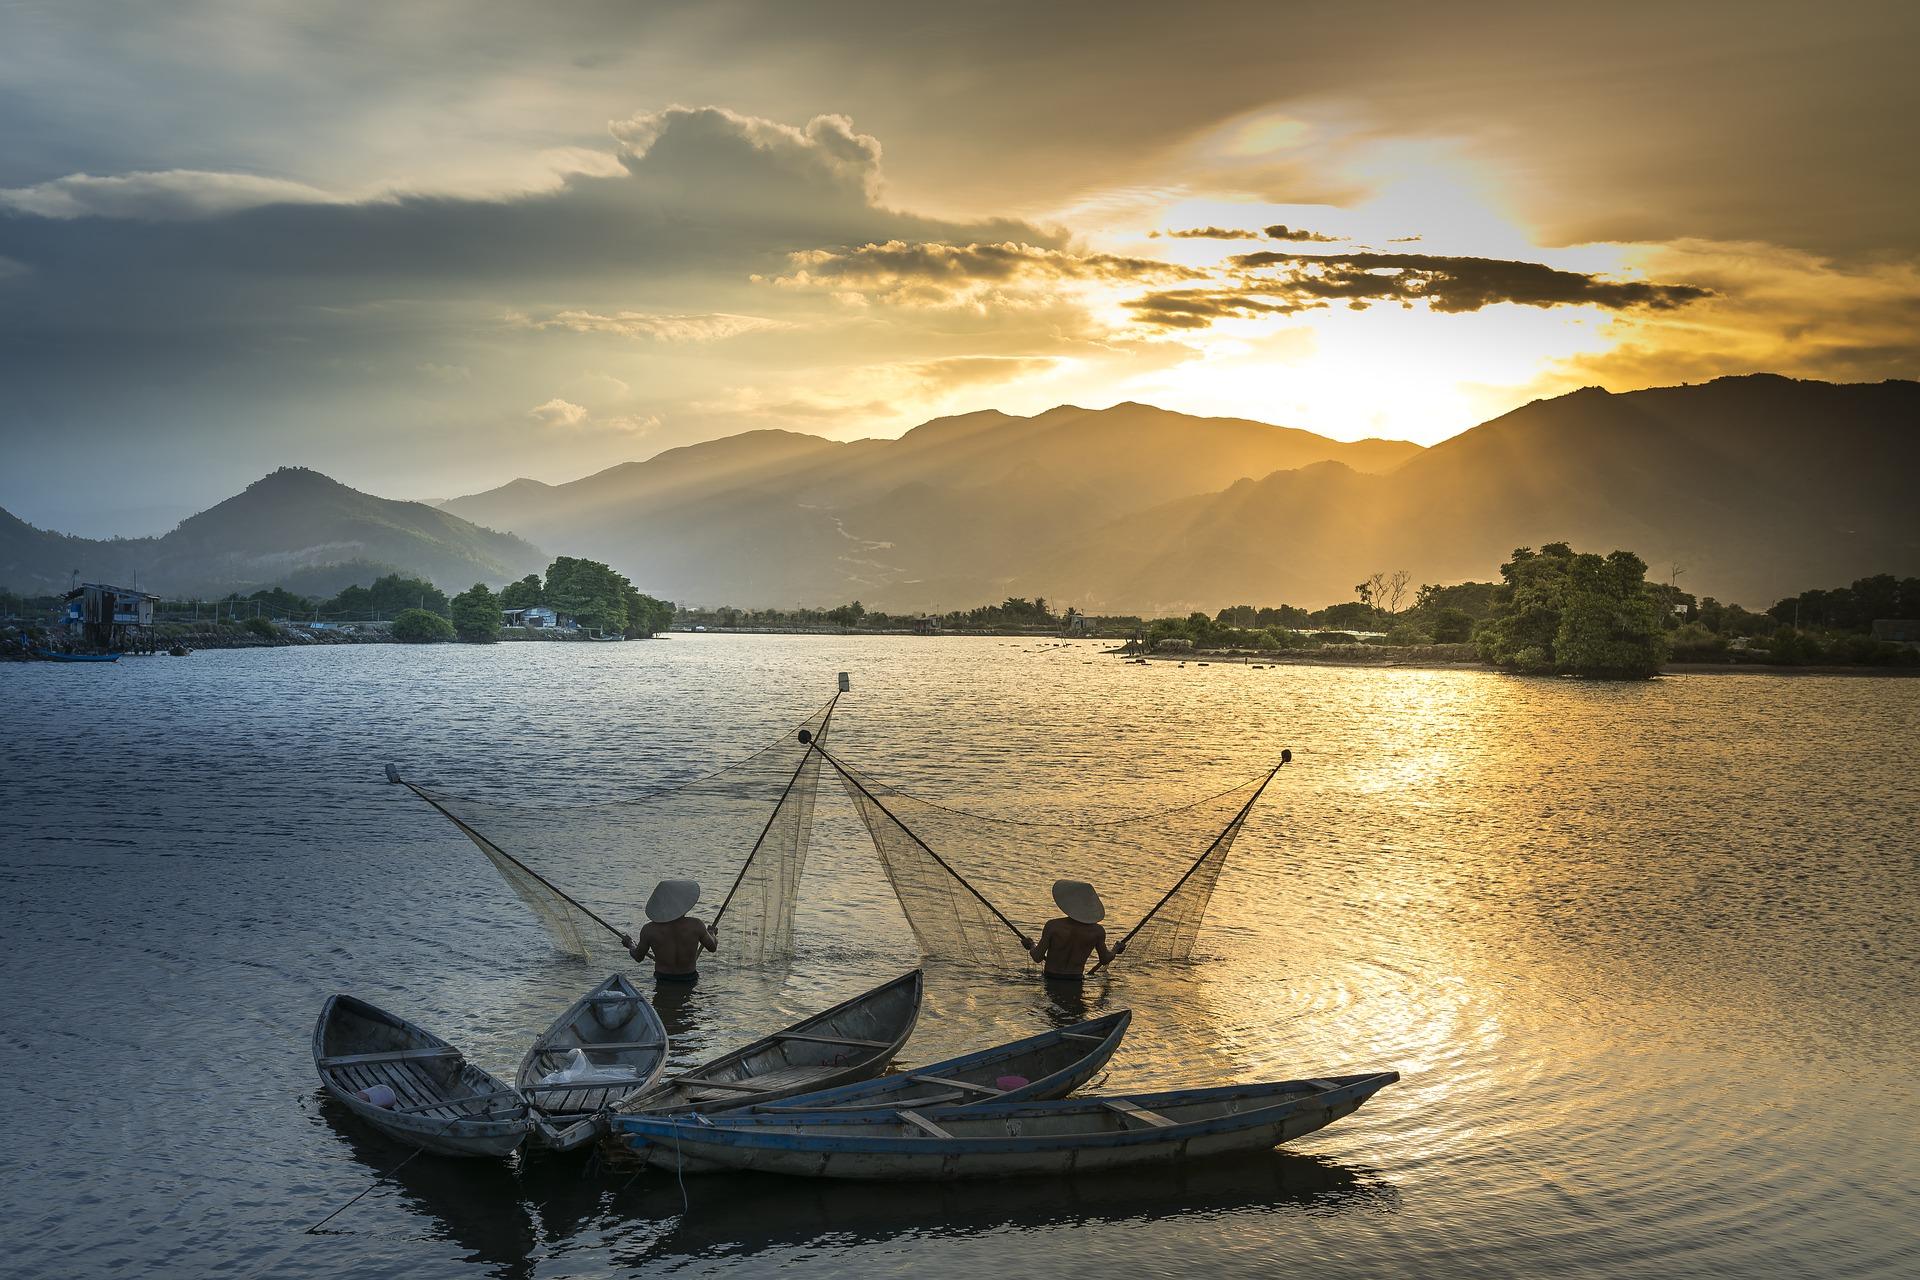 Paisajes a lo largo del río Mekong y Nong Khai